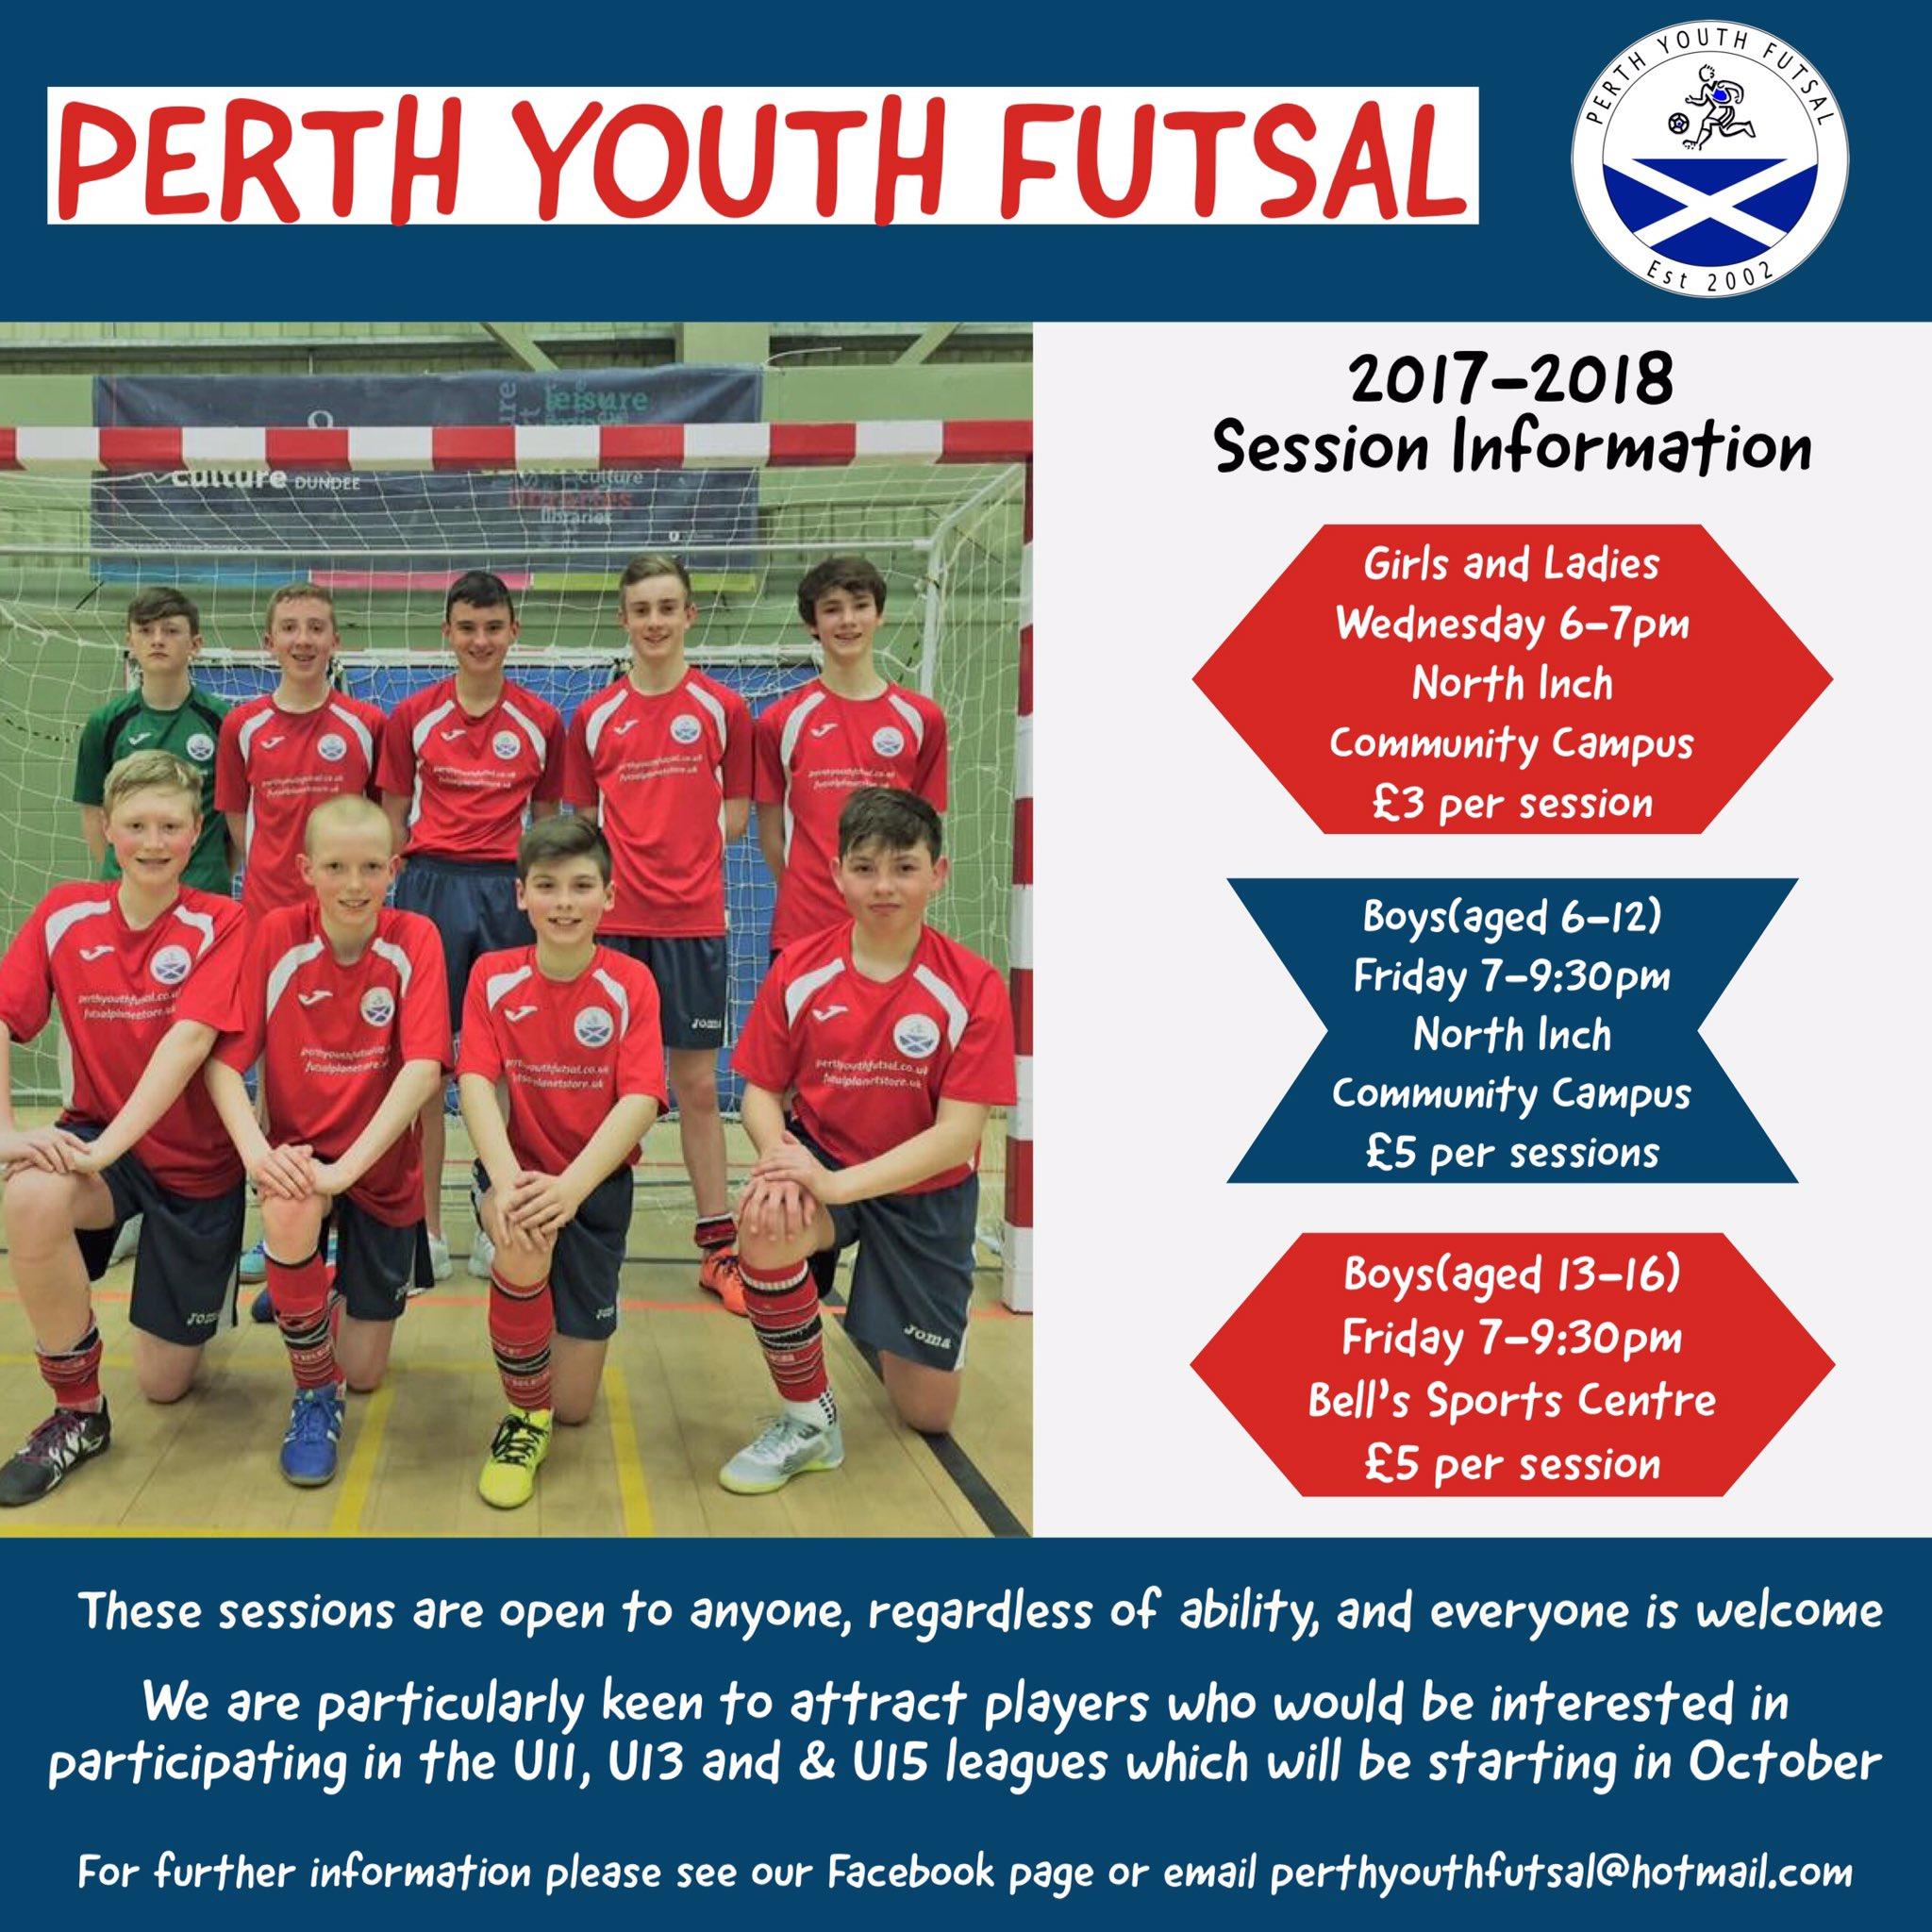 Perth Youth Futsal on Twitter: